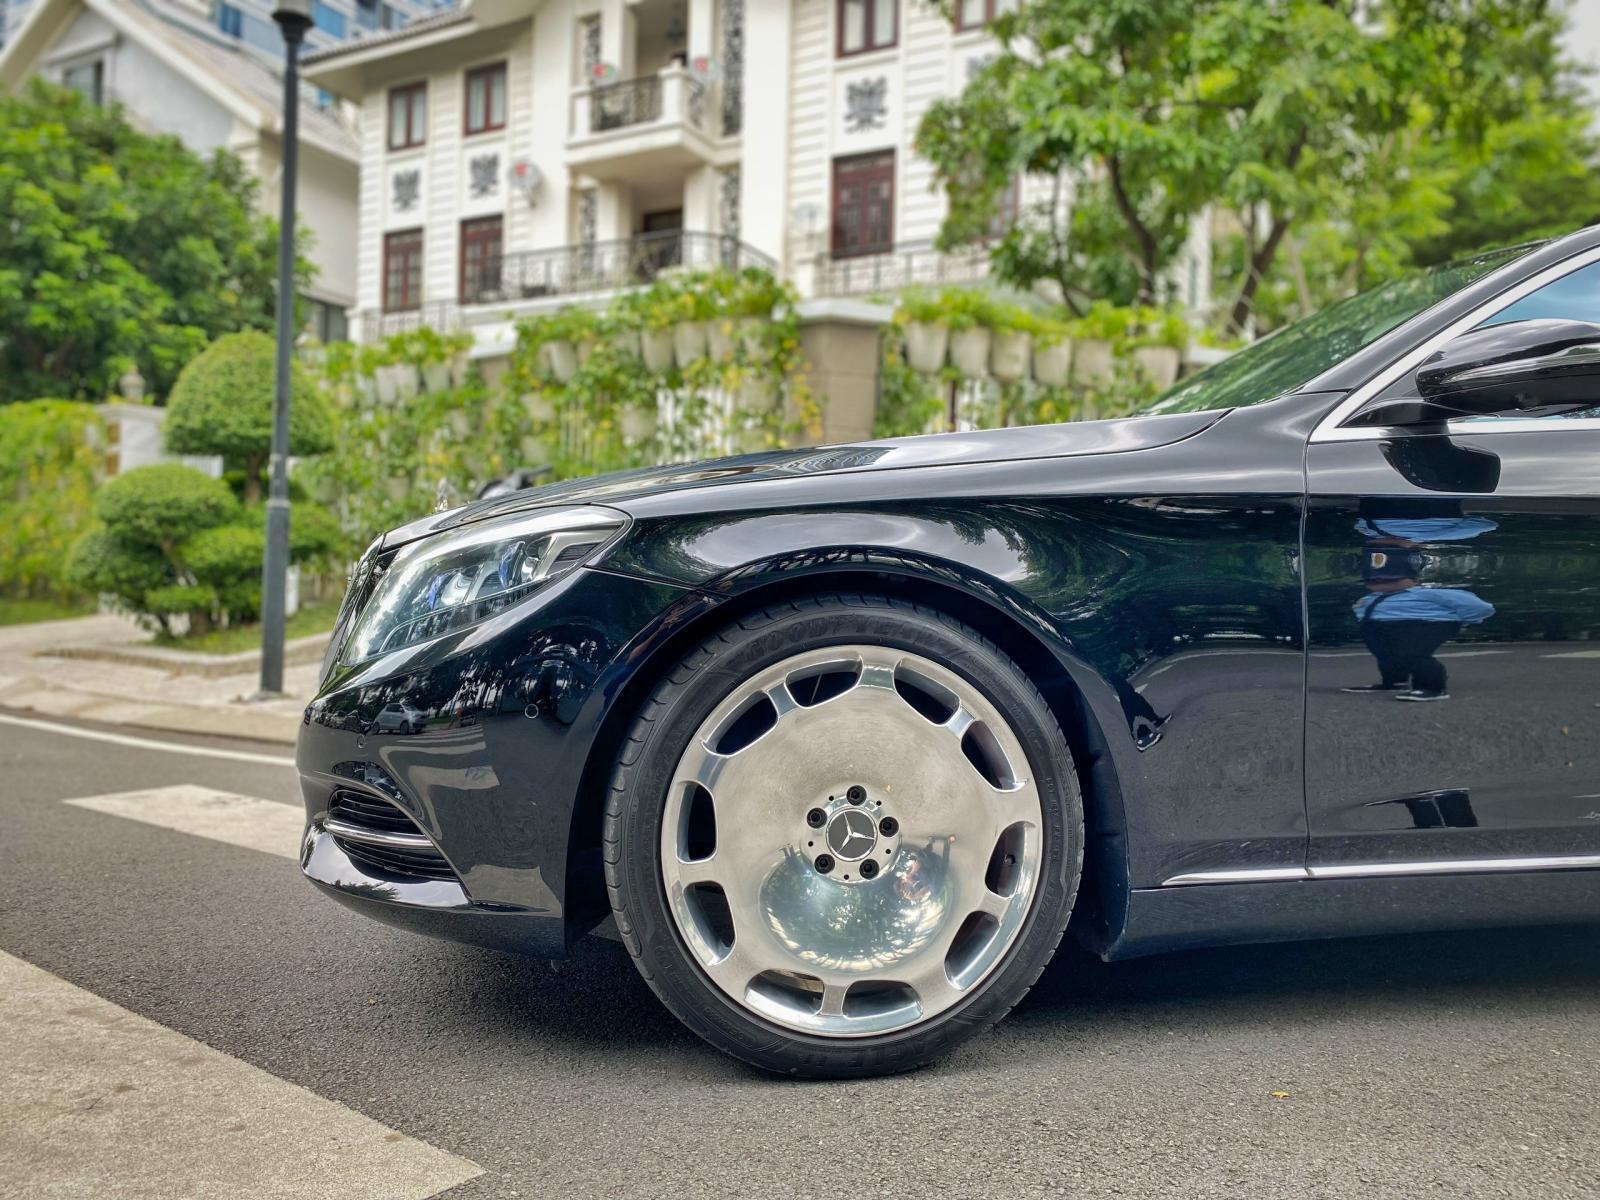 Cần bán xe Mercedes S500 đời 2015, màu đen